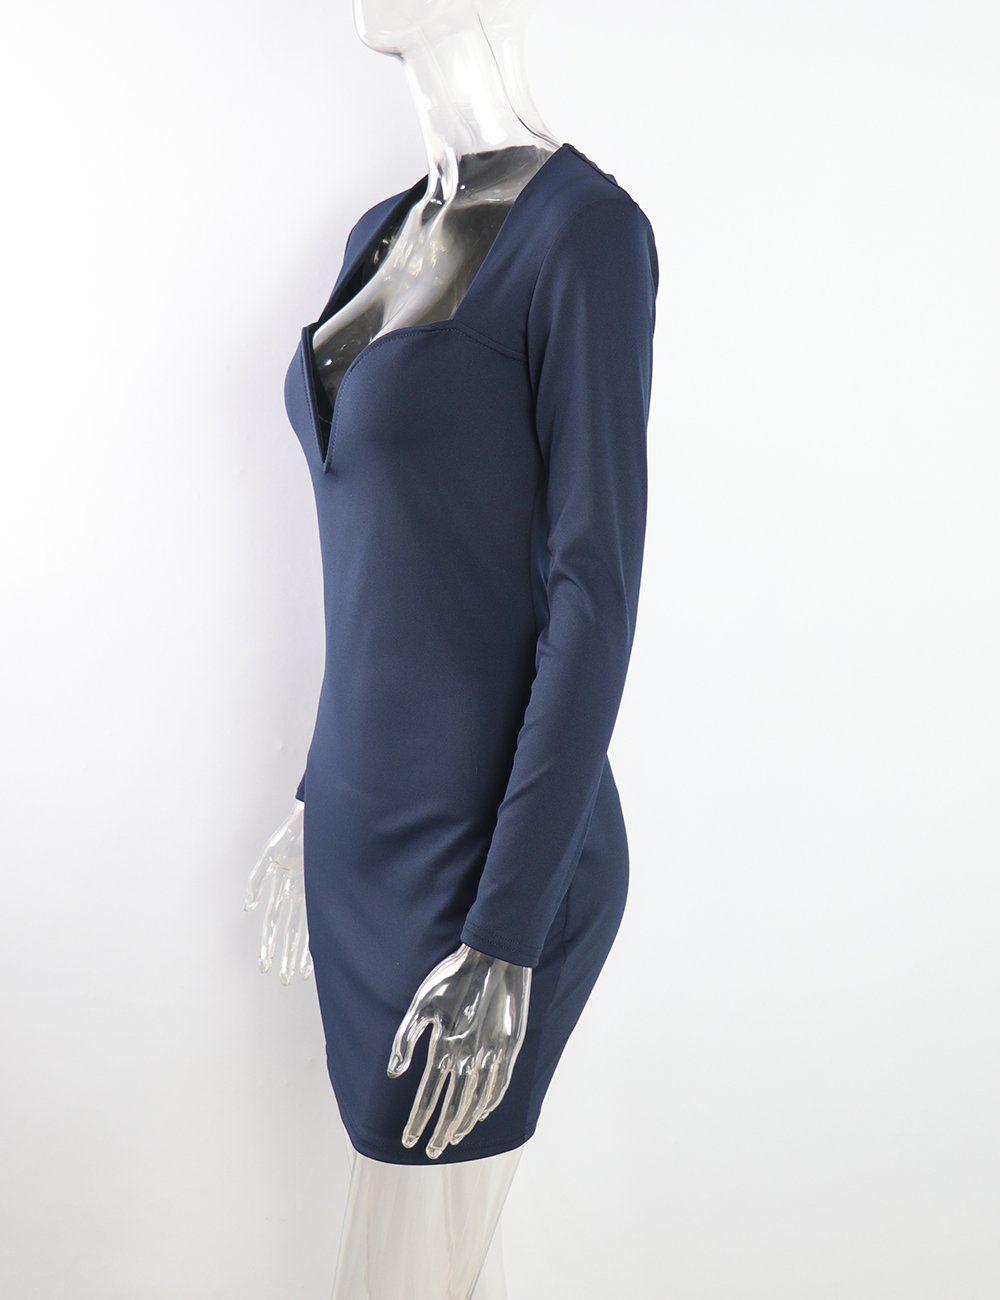 b1116869bc7 UZZDSS UD2605RoyalBlueS Sexy Low Cut Mini Bodycon Club Party Dress Black  White Red Blue Women Long Sleeve Sheath Autumn Dress -- See this fantastic  item.